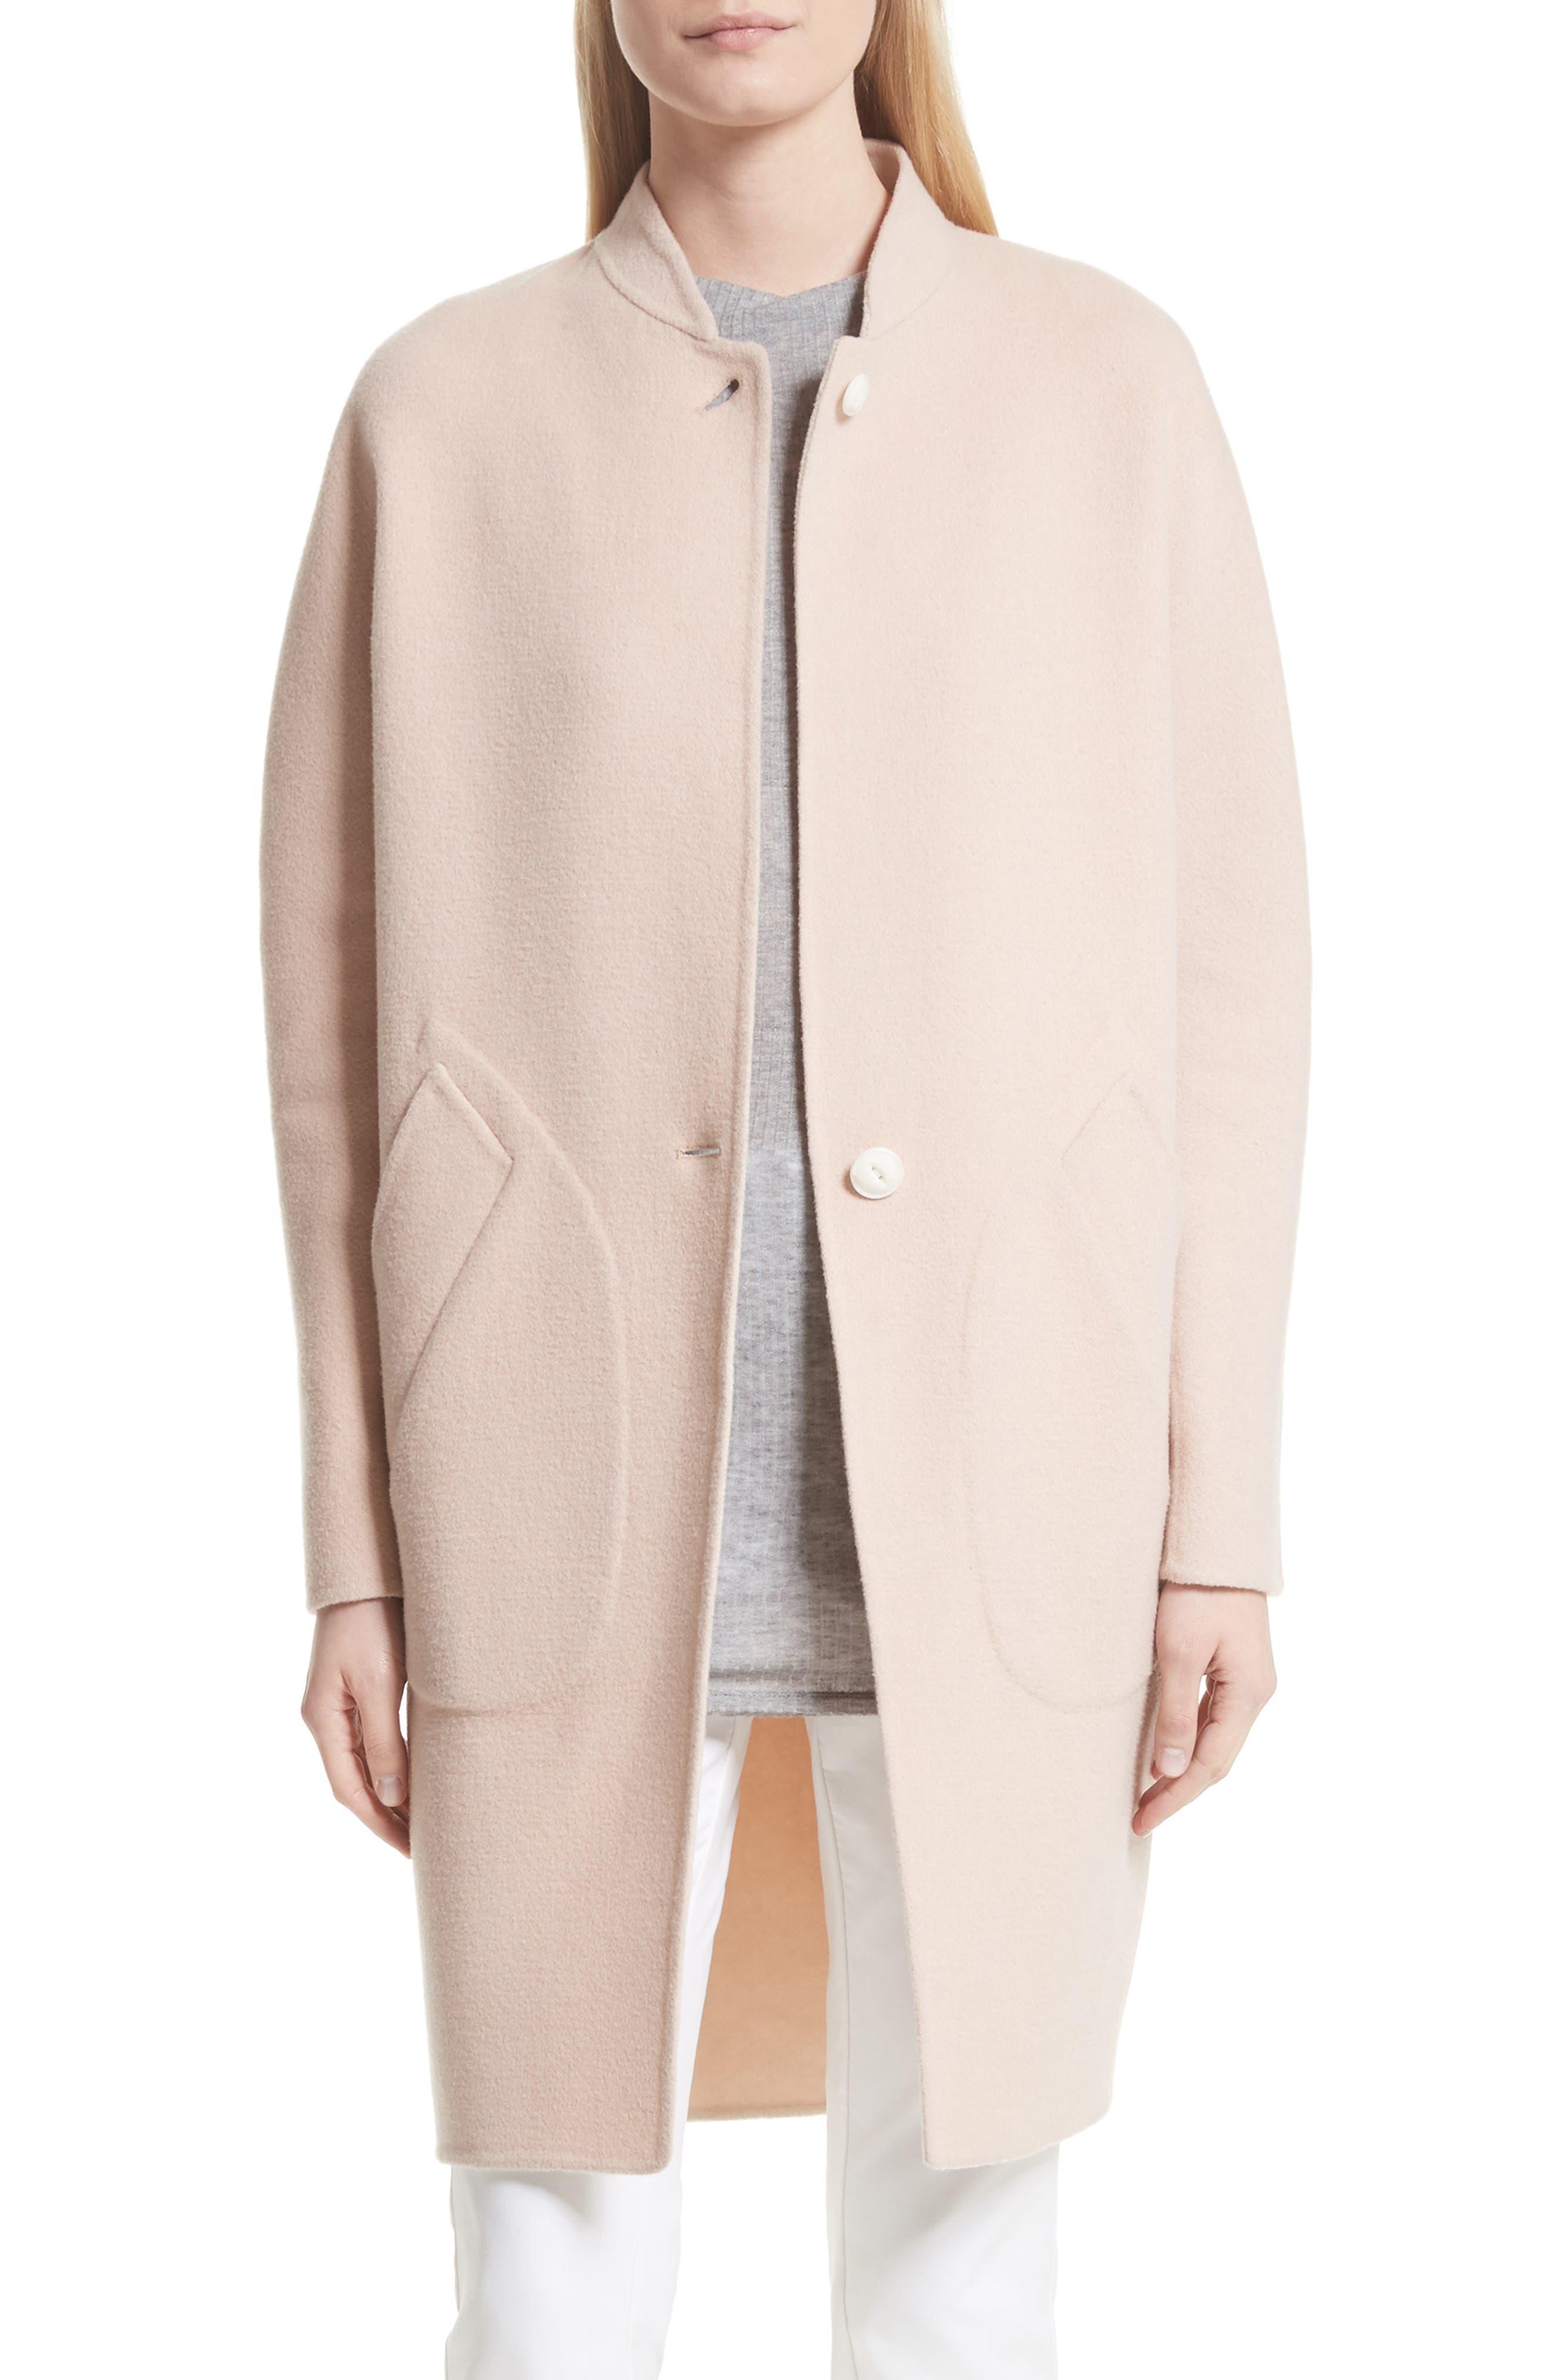 Alternate Image 1 Selected - rag & bone Darwen Reversible Wool & Cashmere Coat